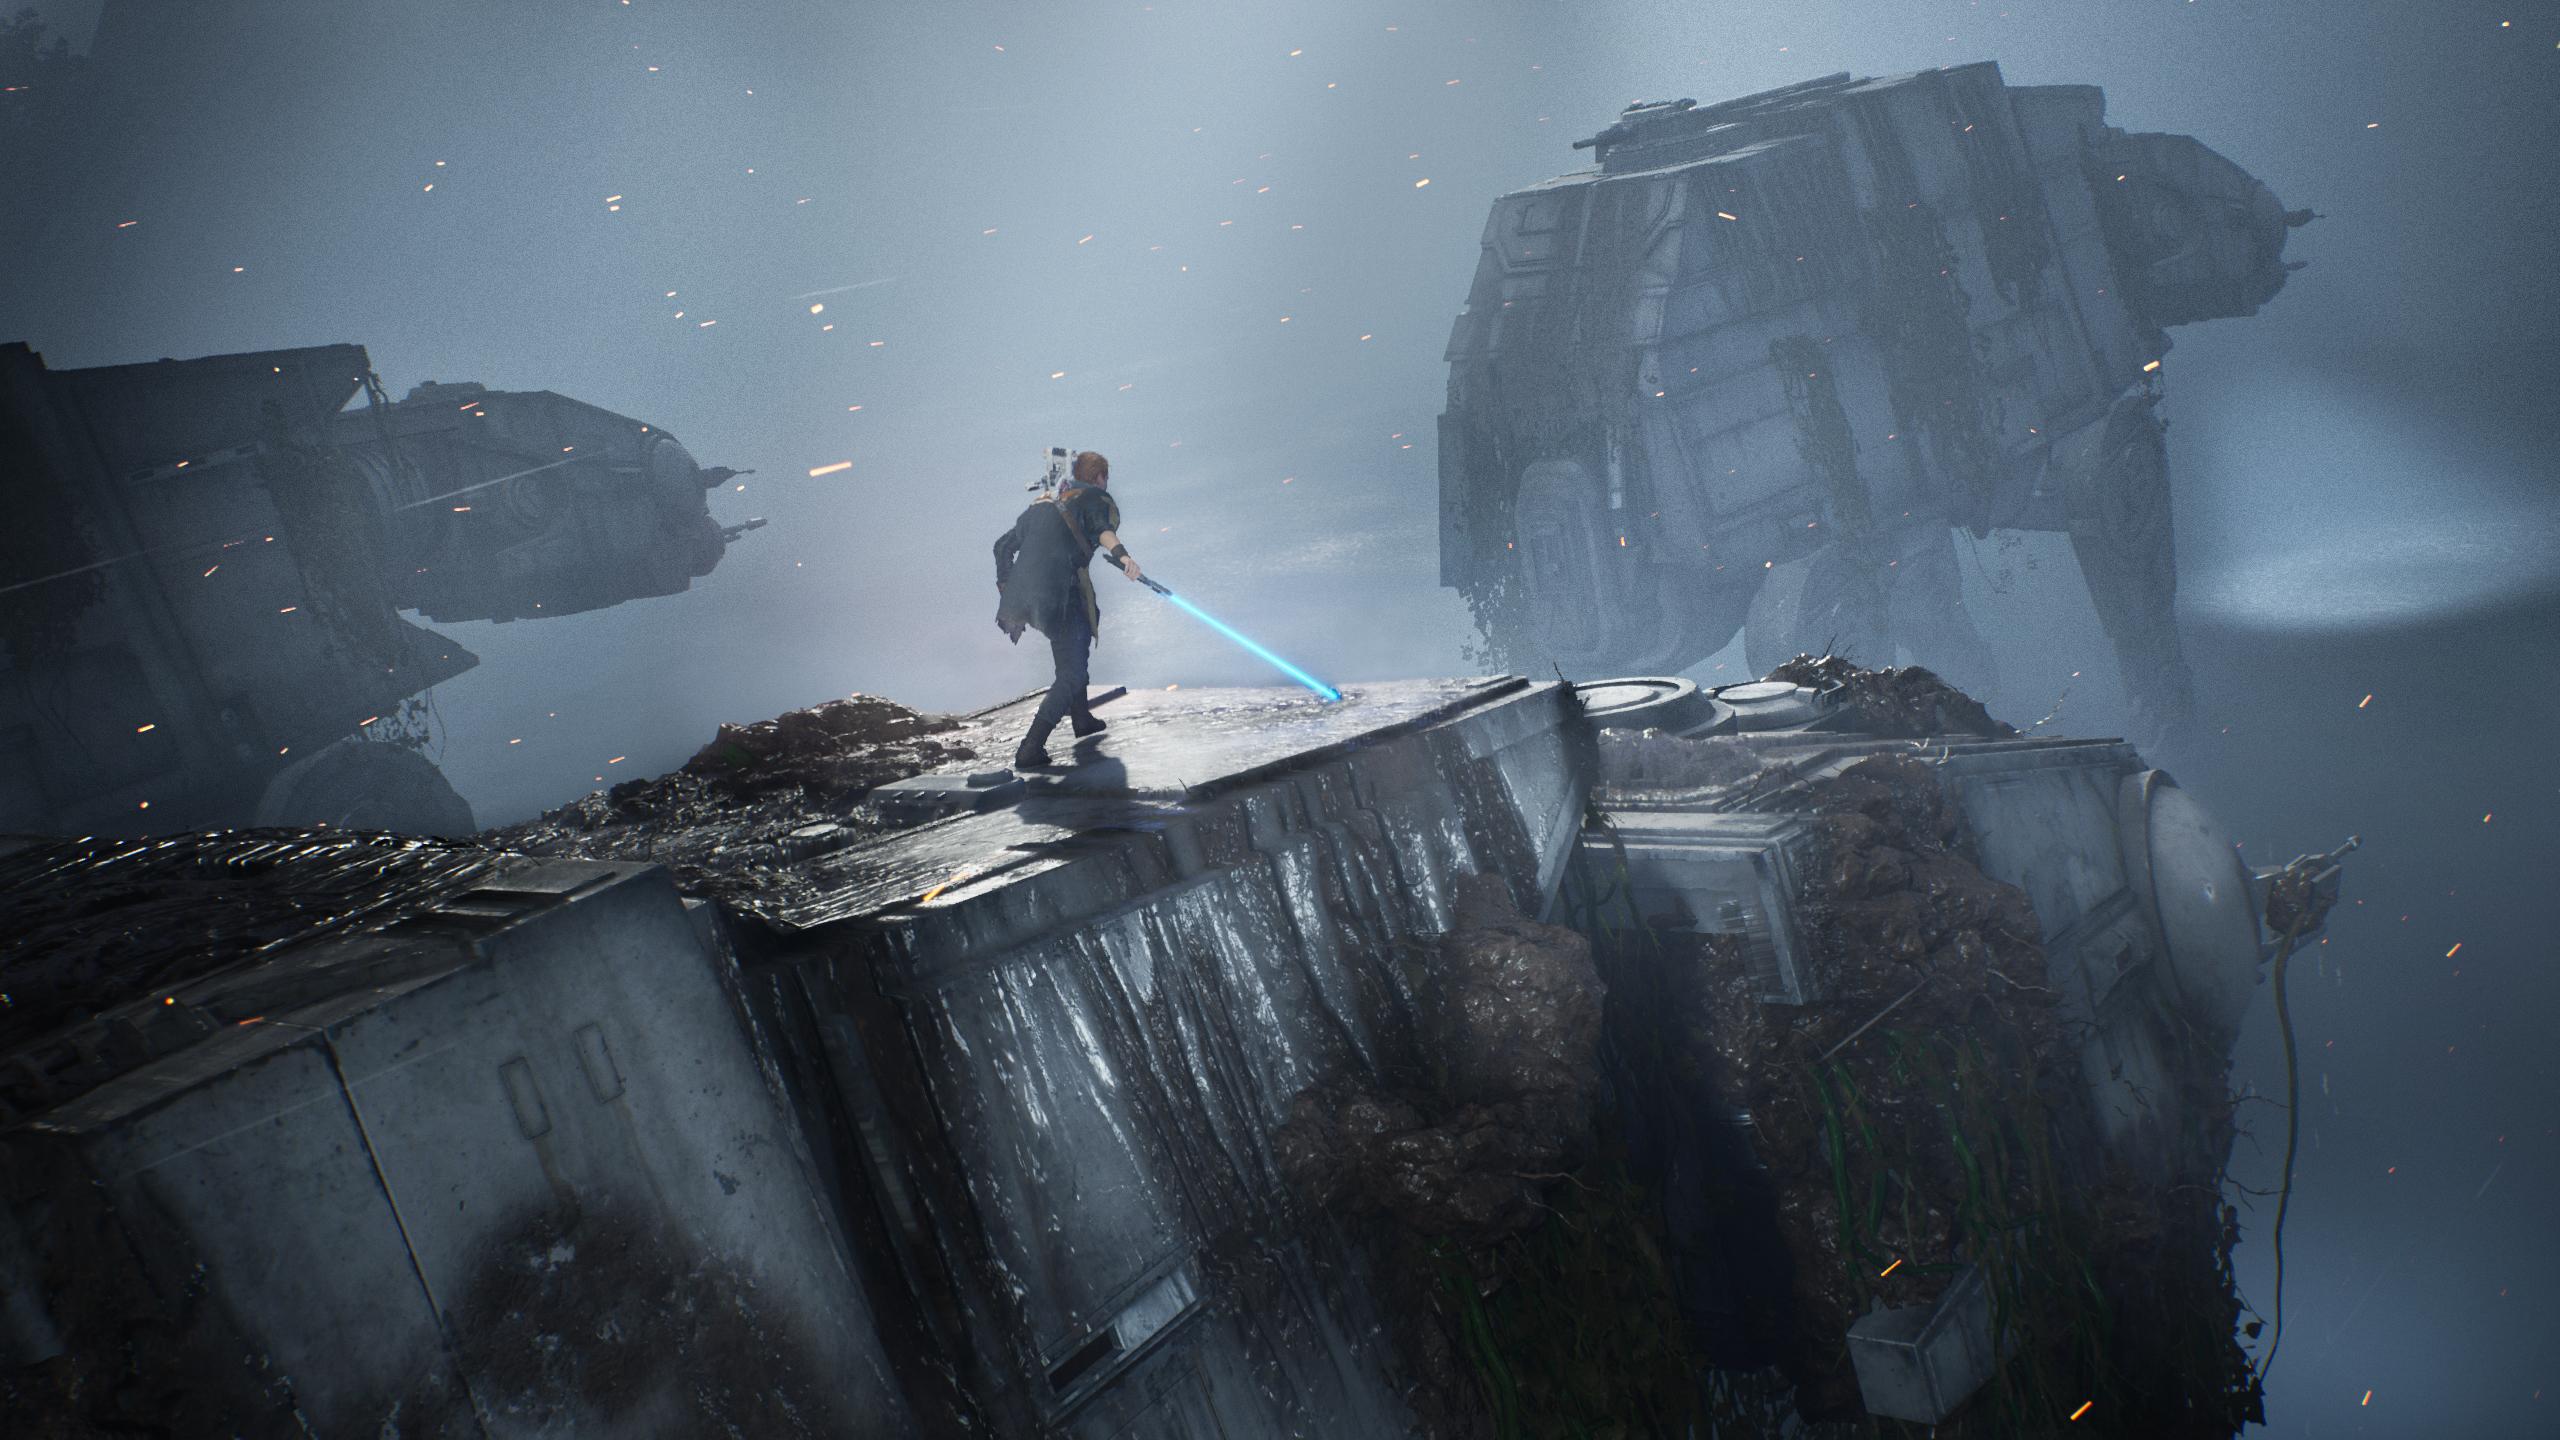 Star Wars Jedi Fallen Order Hd Wallpaper Background Image 2560x1440 Id 1020916 Wallpaper Abyss